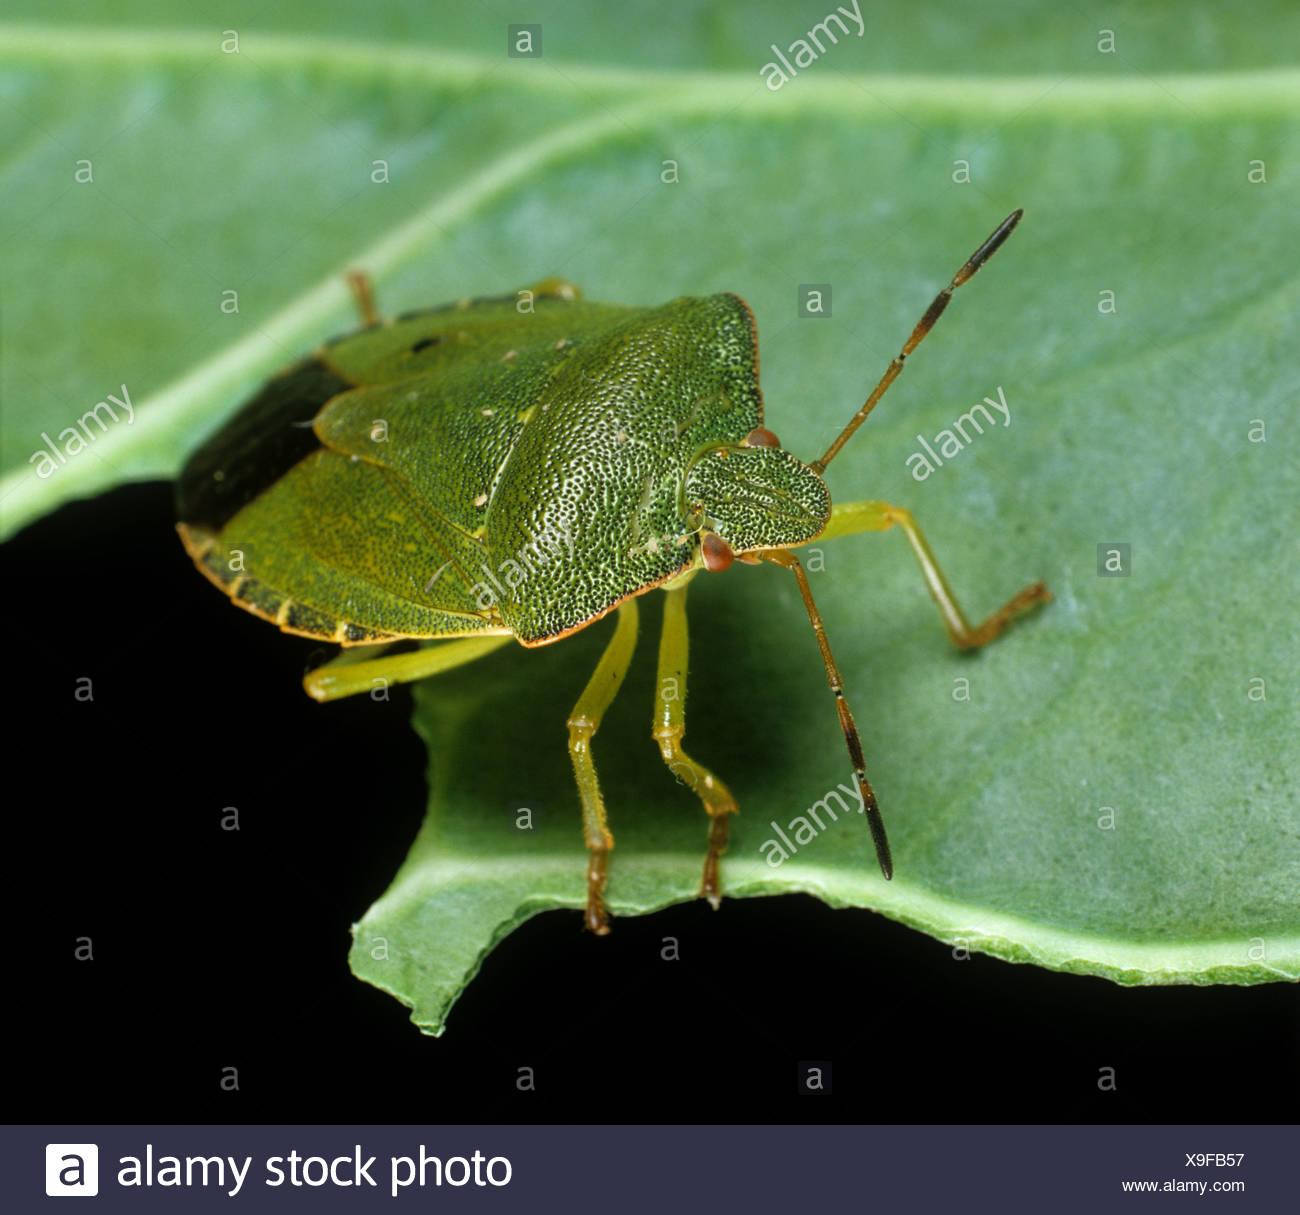 Grünes Schild Bug (Palomena Prasina) Erwachsenen auf einem Blatt Stockbild